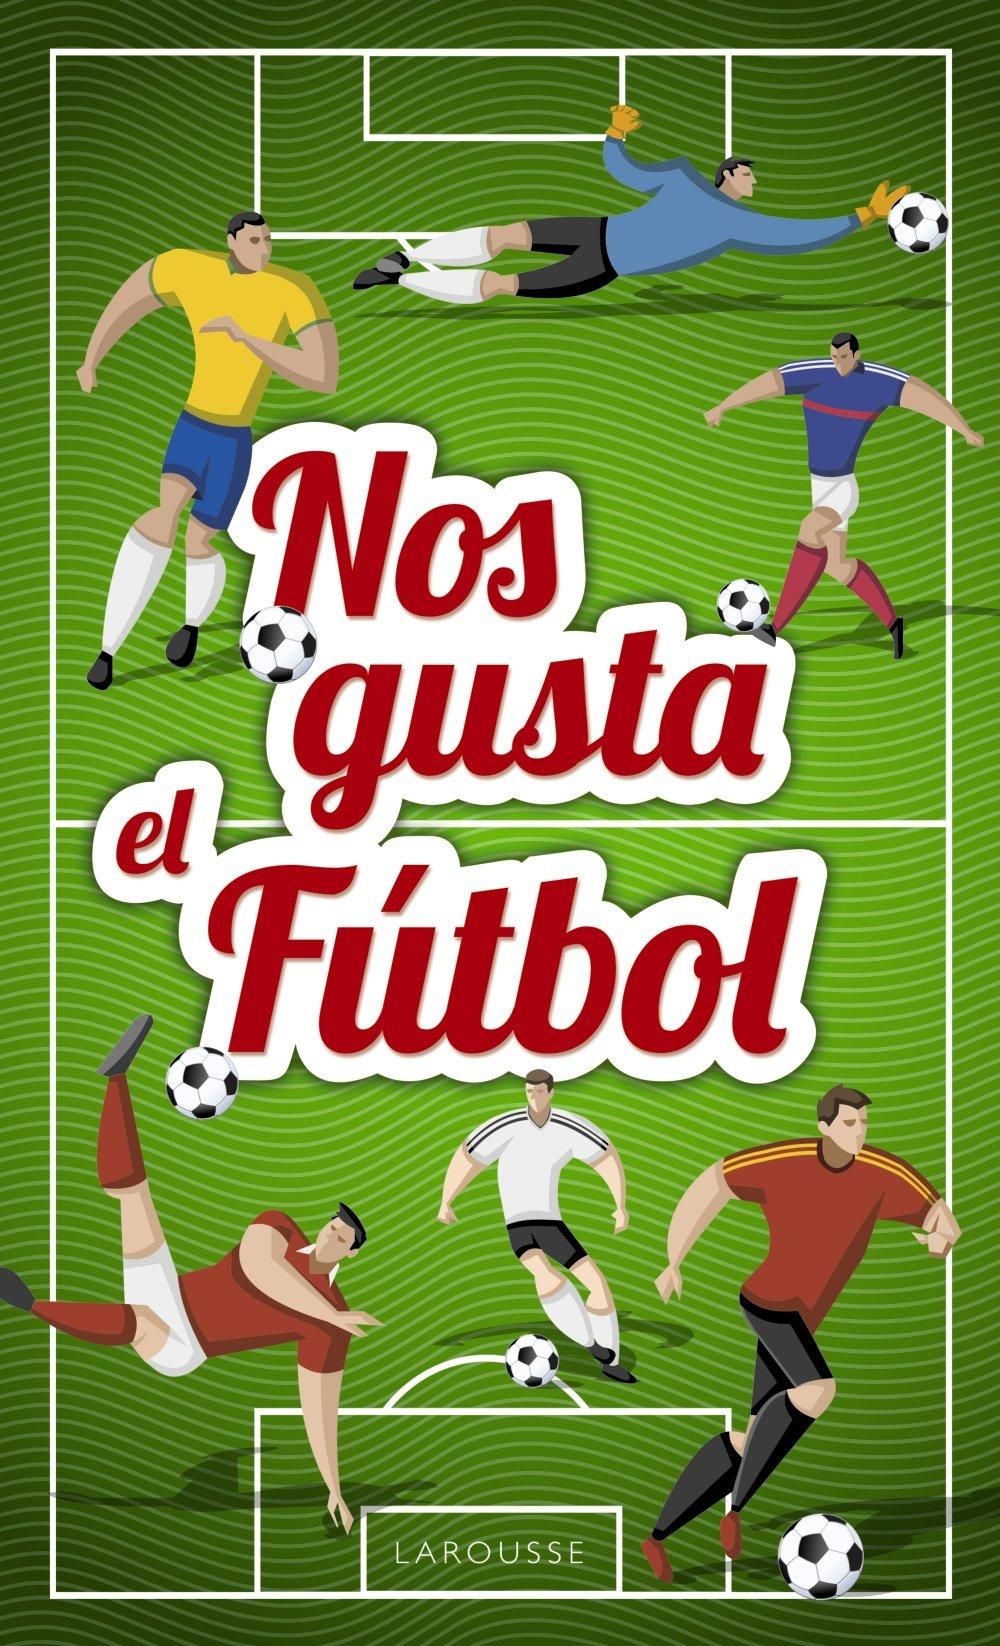 Nos gusta el fútbol Larousse - Infantil / Juvenil - Castellano - A Partir De 3 Años - Libros Singulares: Amazon.es: Larousse Editorial, Alain Boyer, ...